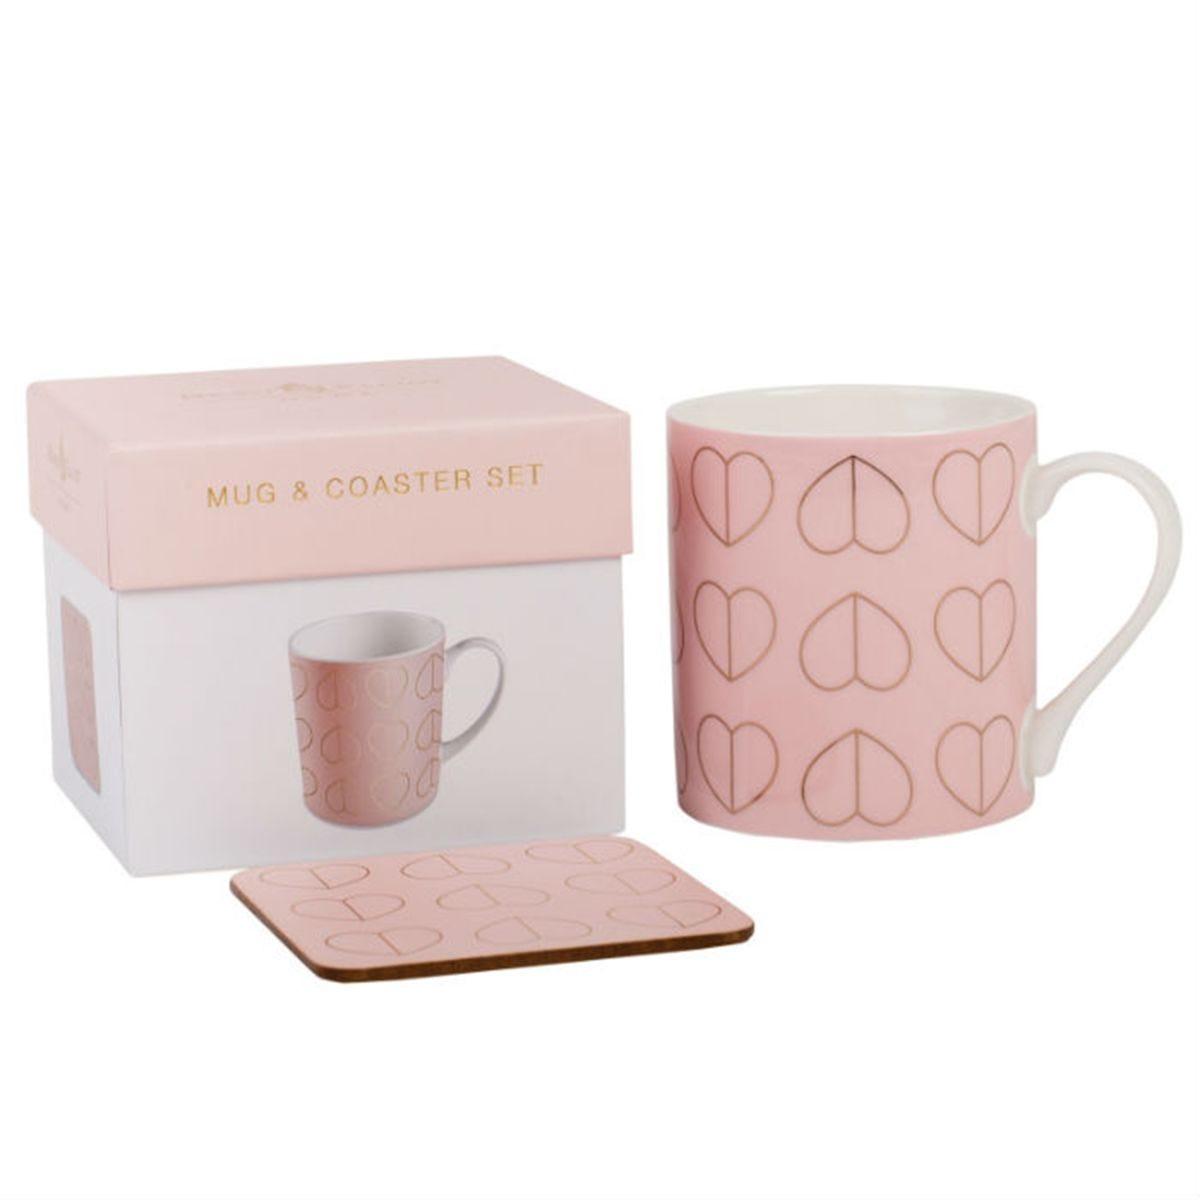 Beau & Elliot Champagne Edit Blush Mug & Coaster Set